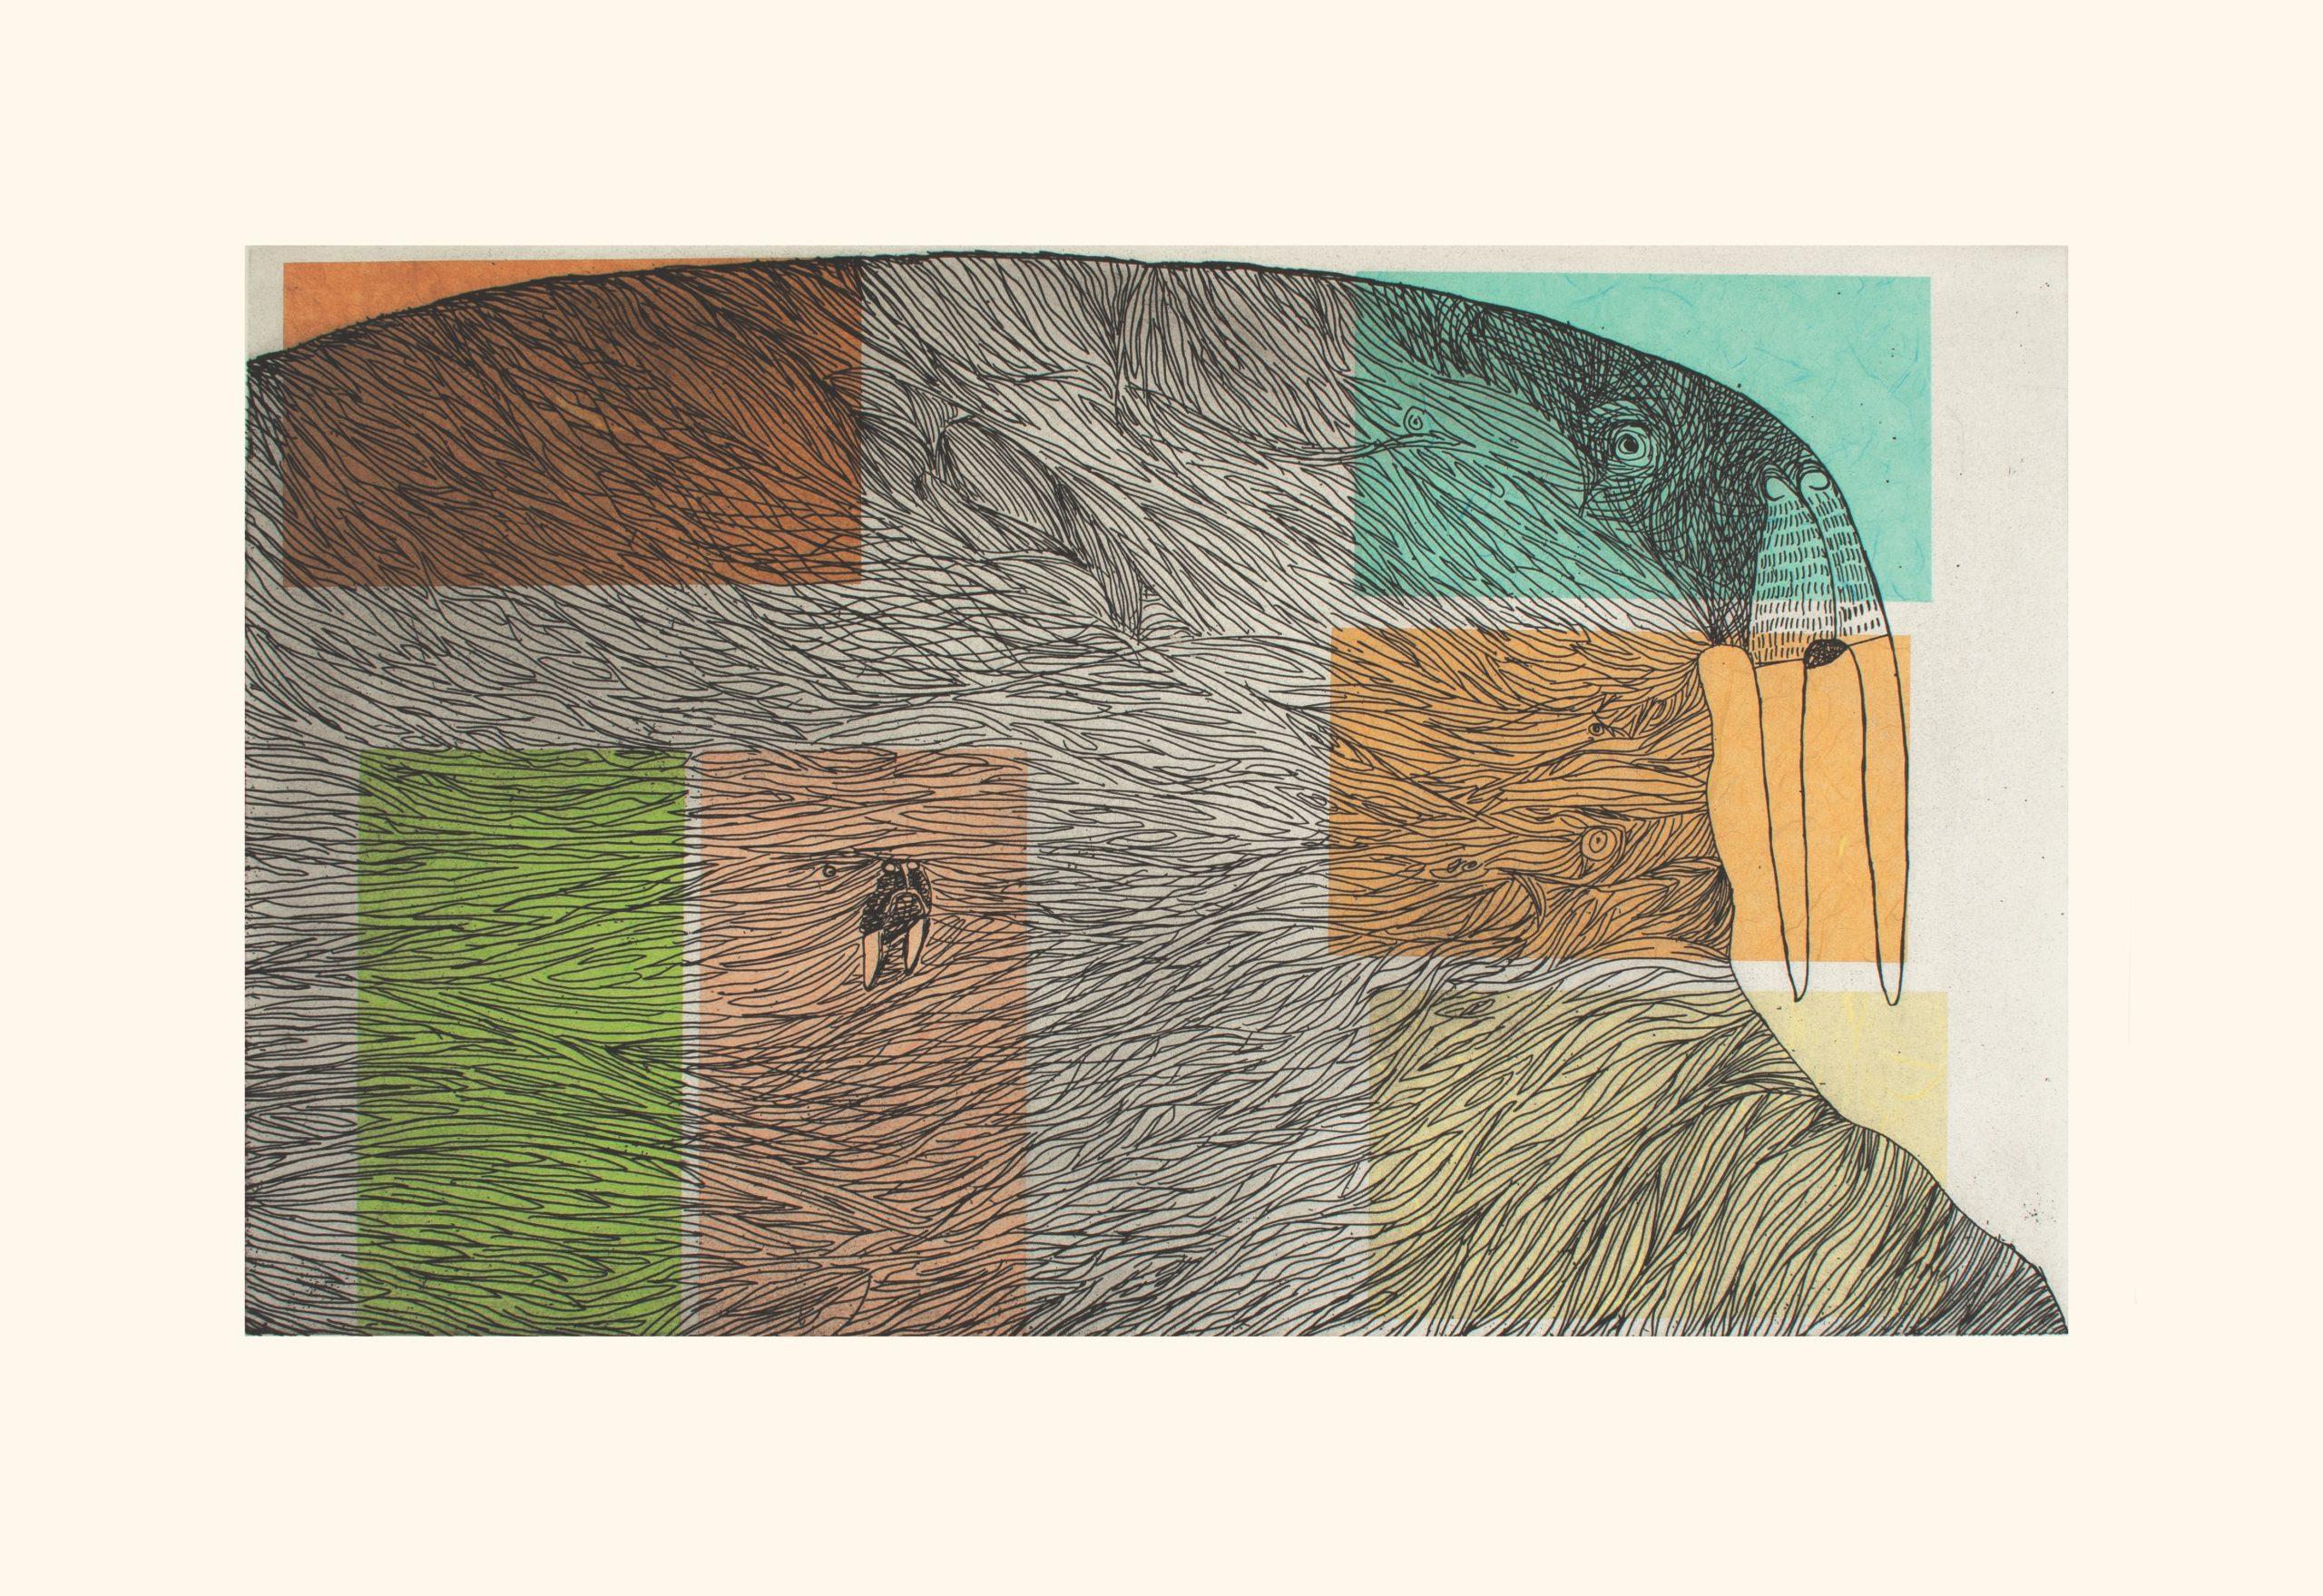 Ancestral Walrus by Ningiukulu Teevee